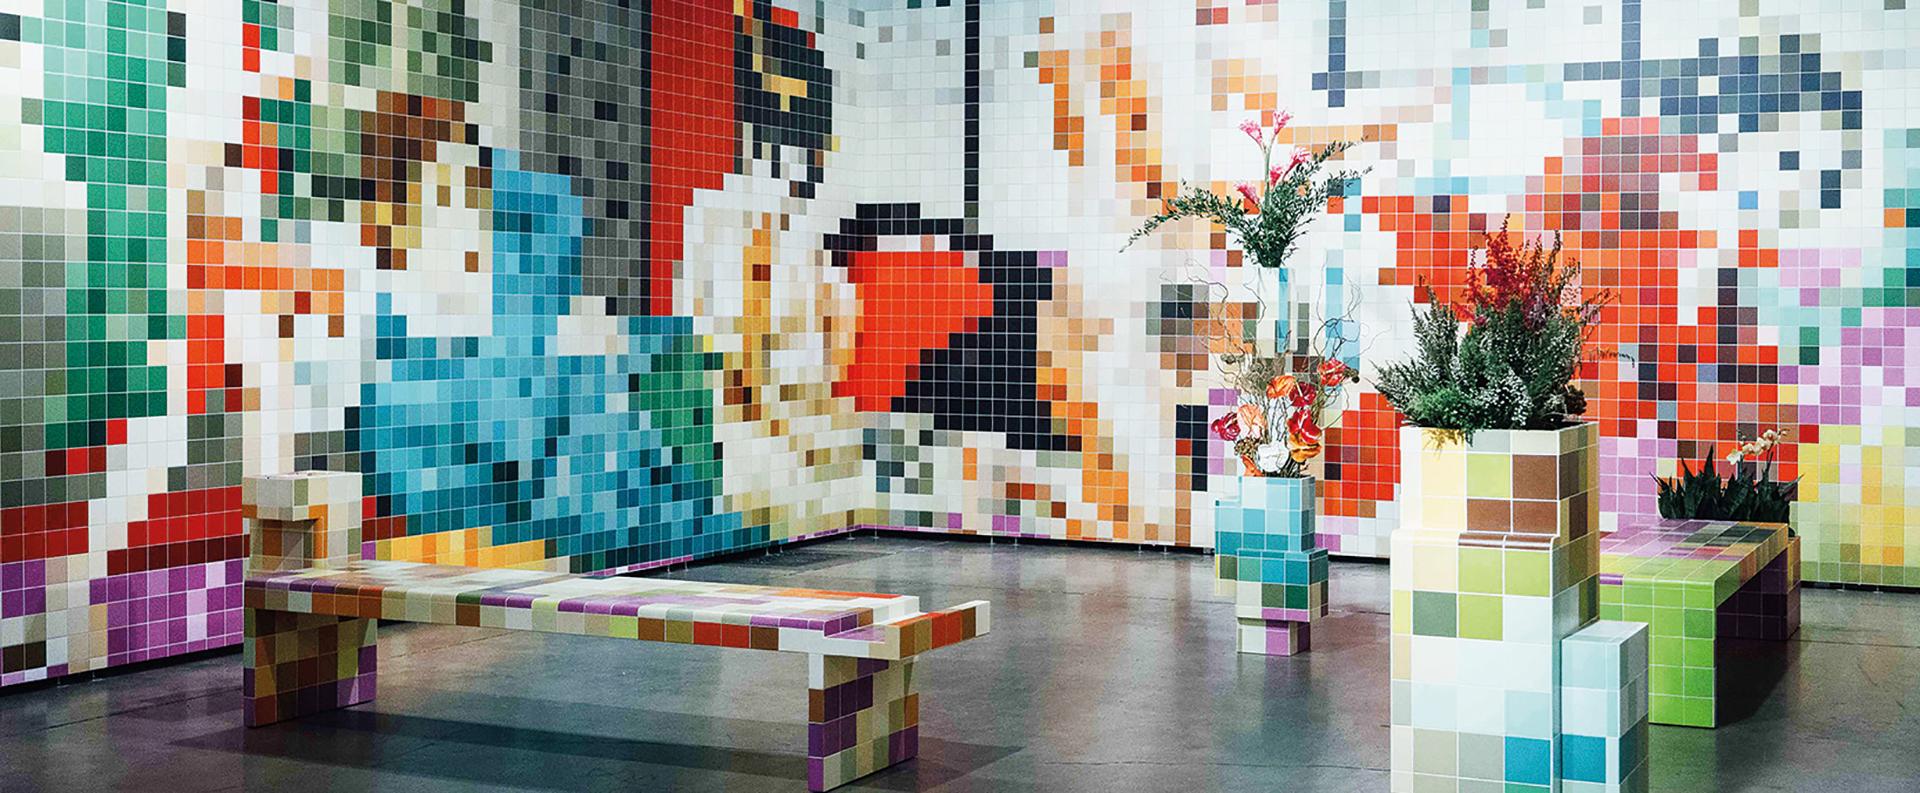 Fondation Beyeler Art Basel